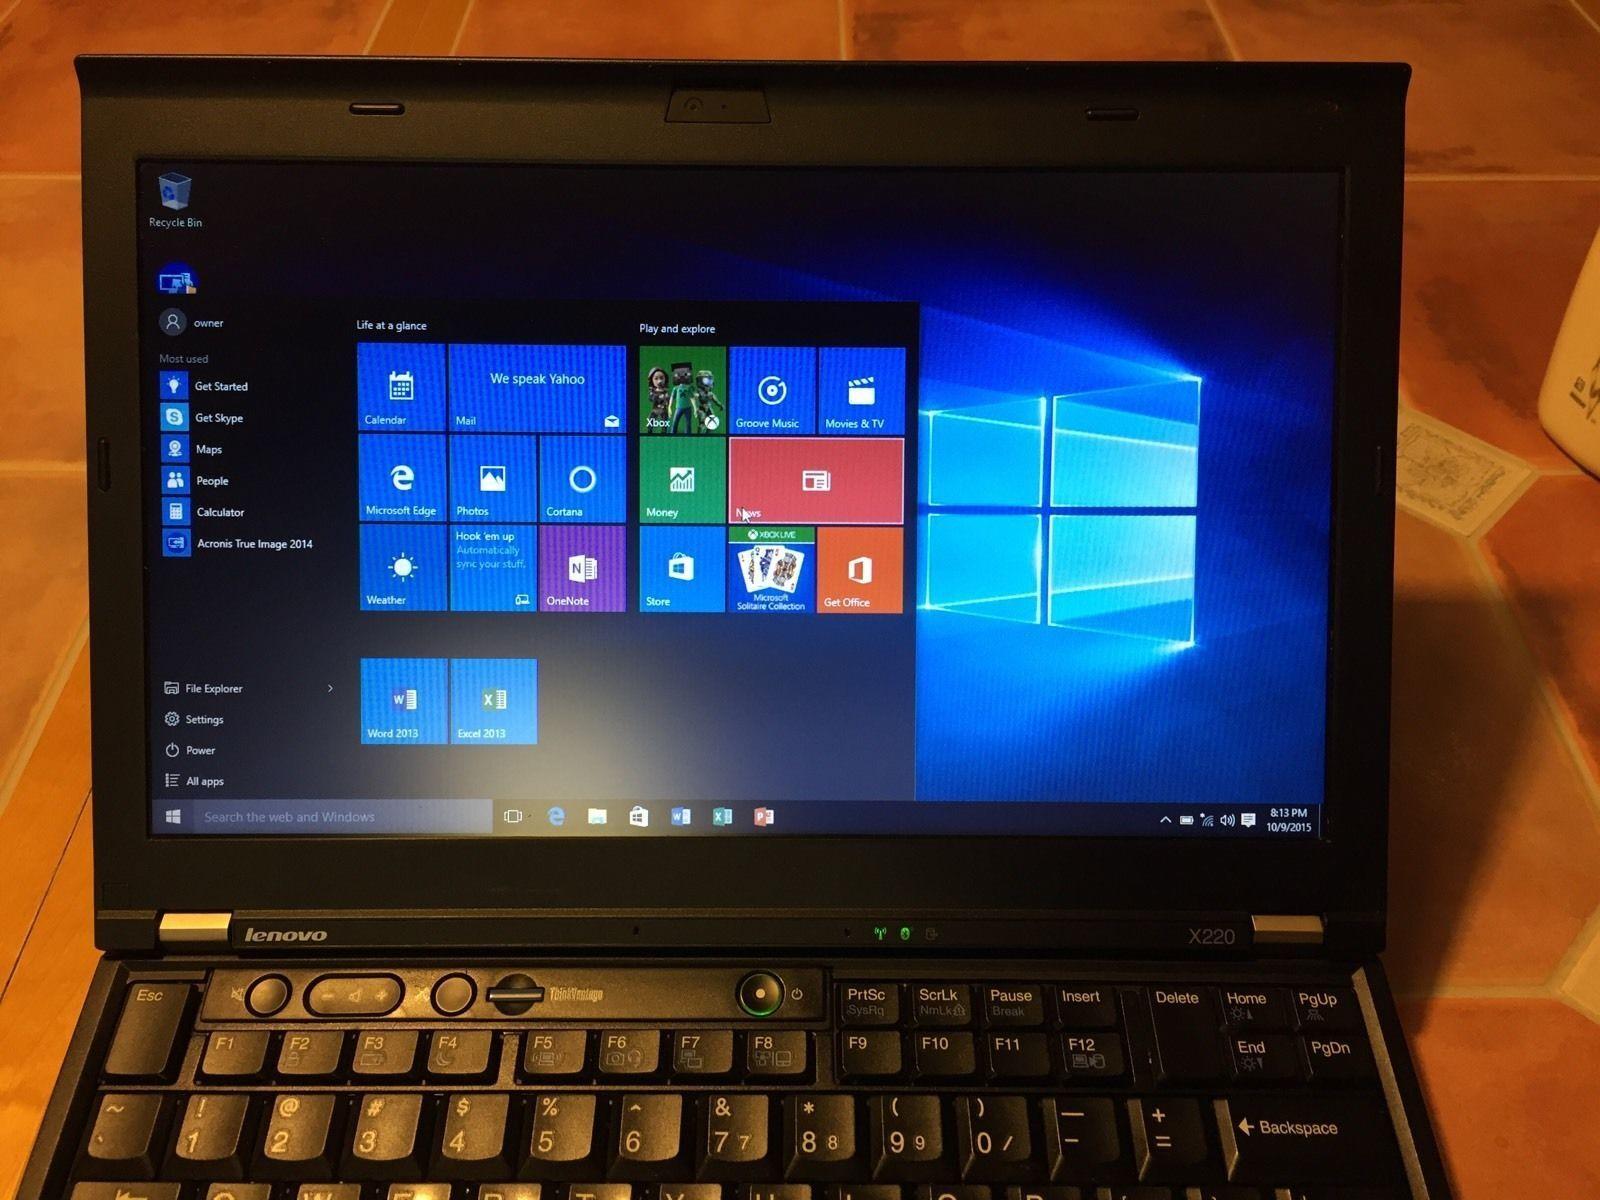 Lenovo ThinkPad Laptop X220 i5 2.5GHz 8GB 128GB SSD Windows 10 IPS Screen